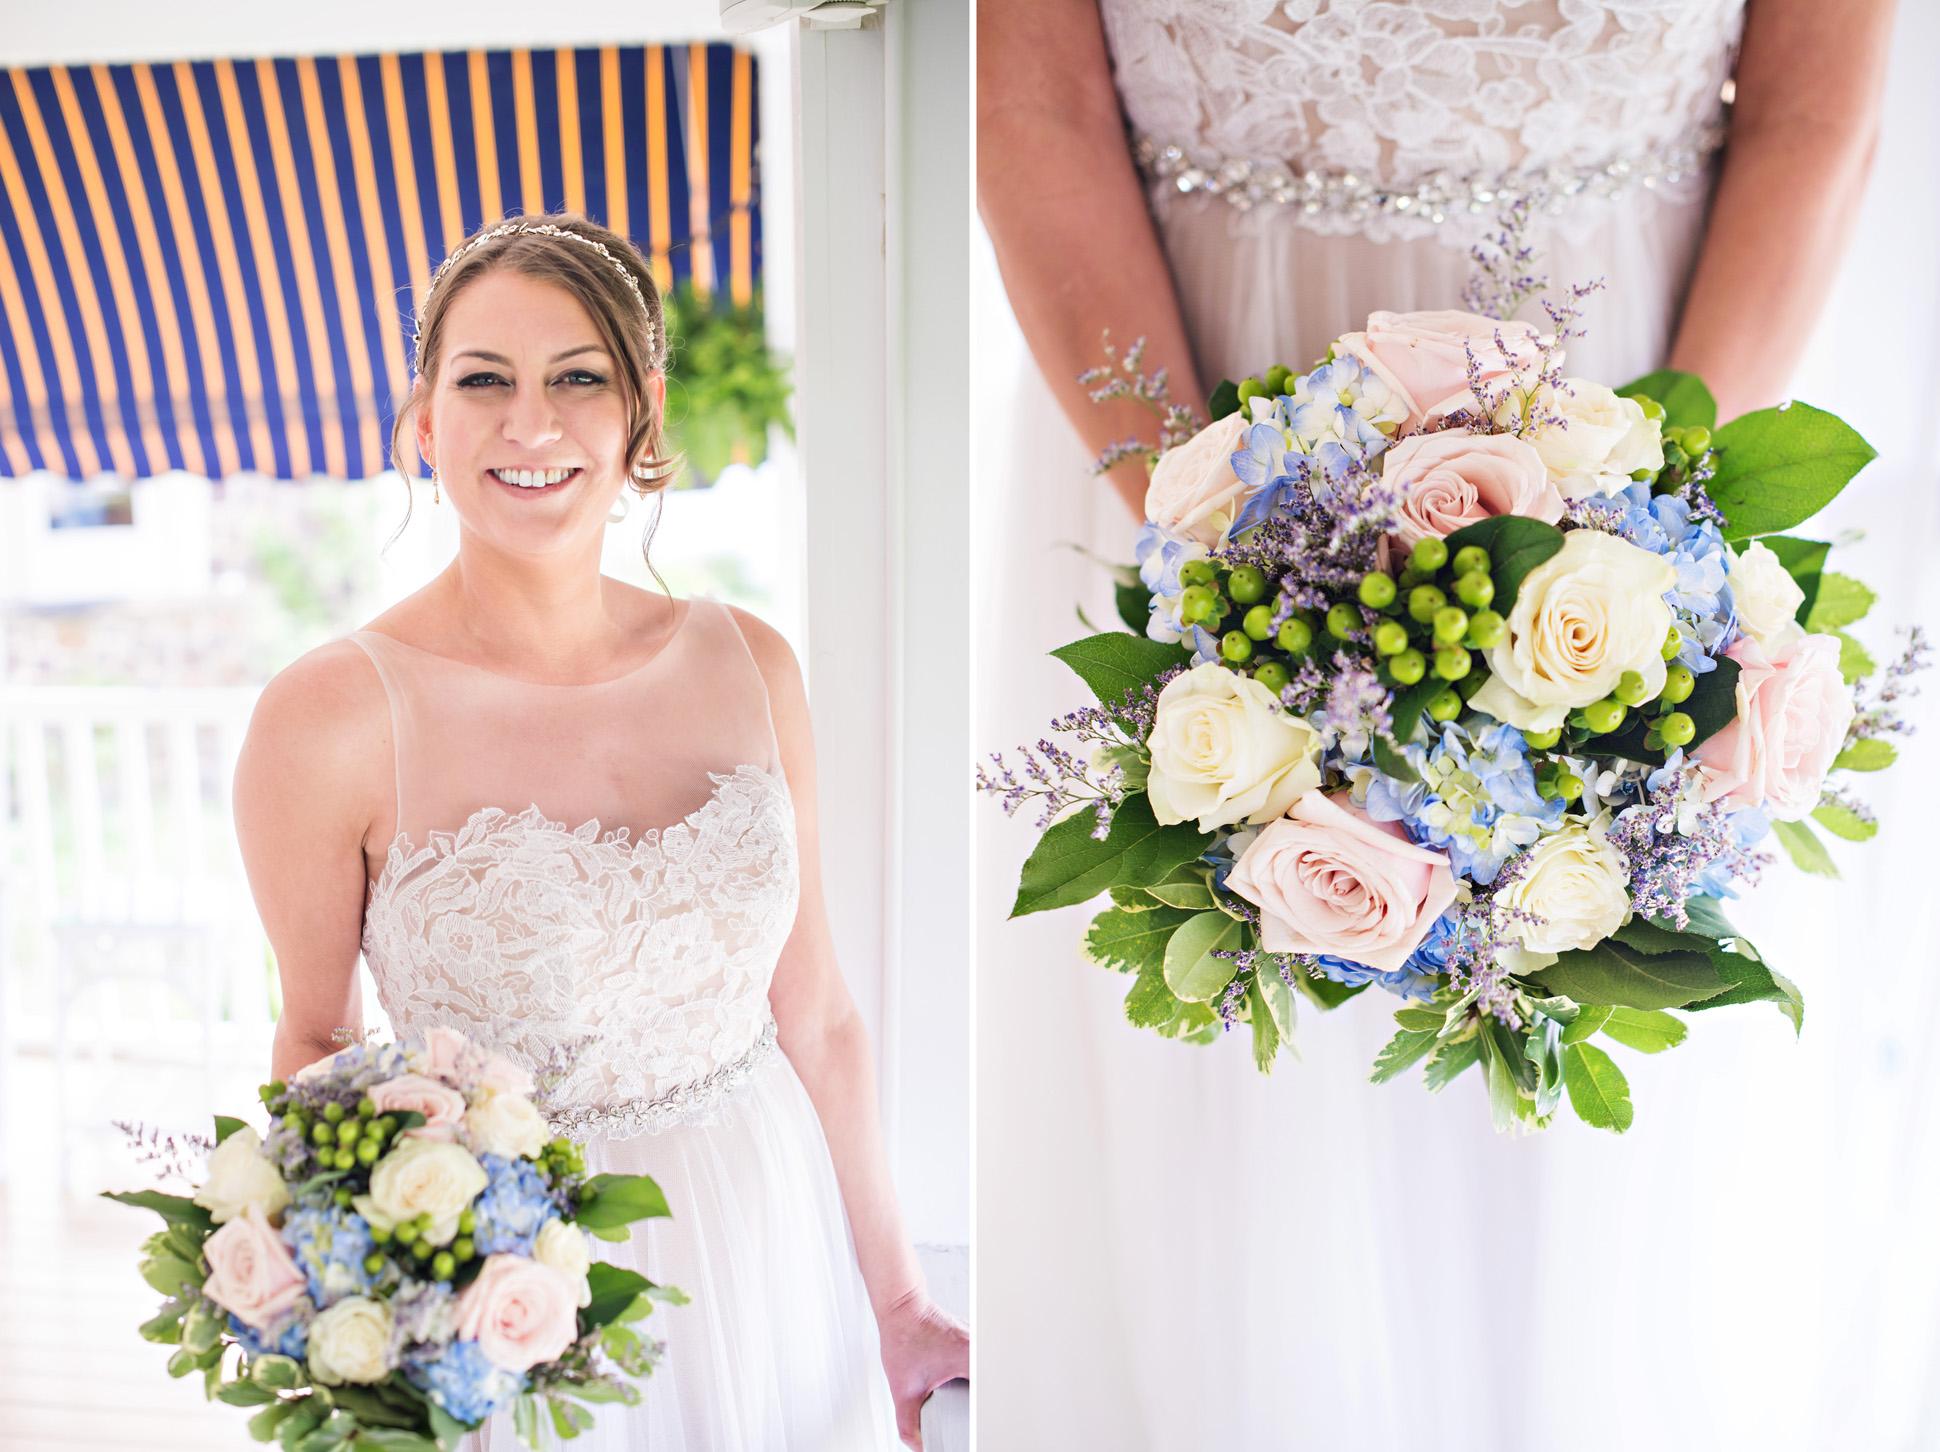 10-Sara Stadtmiller-SRS-Photography-Asbury-Park-Wedding-Photographer-Monmouth-County-Wedding-Photographer-NJ-Wedding-Photographer-Avon-by-the-Sea-Wedding-The-Columns-Wedding-bhldn-dress